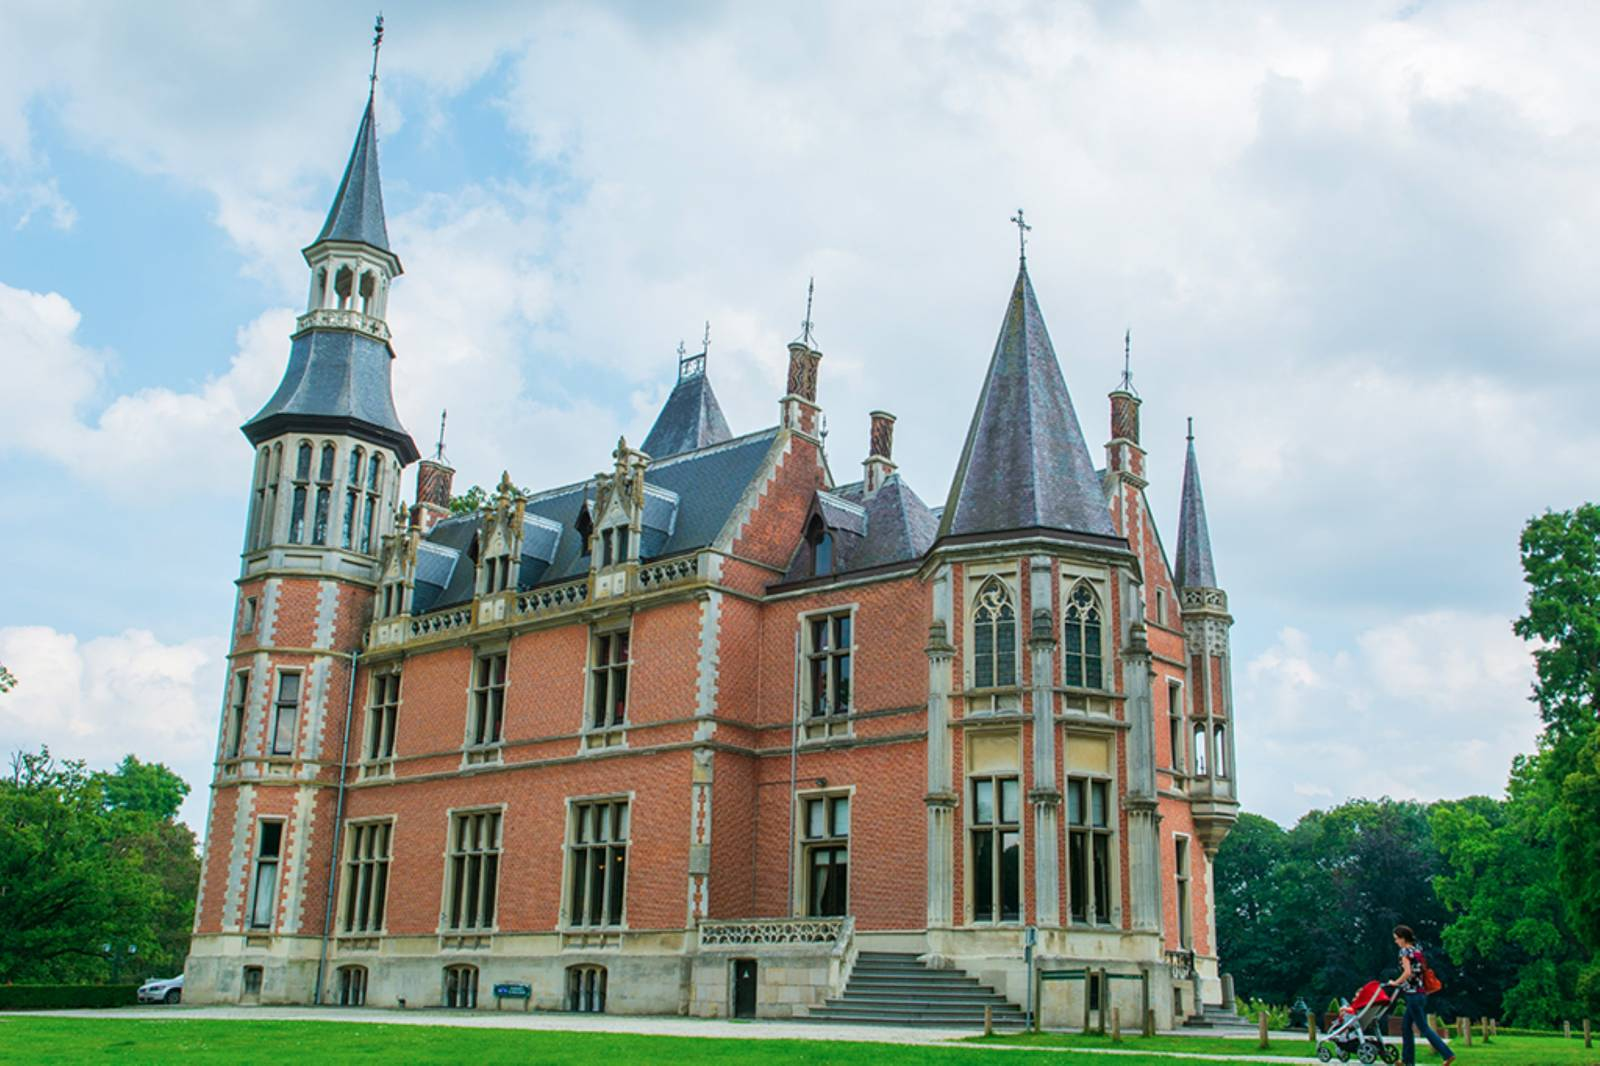 Kasteel D'artrycke - Feestzaal - House of Weddings (6)